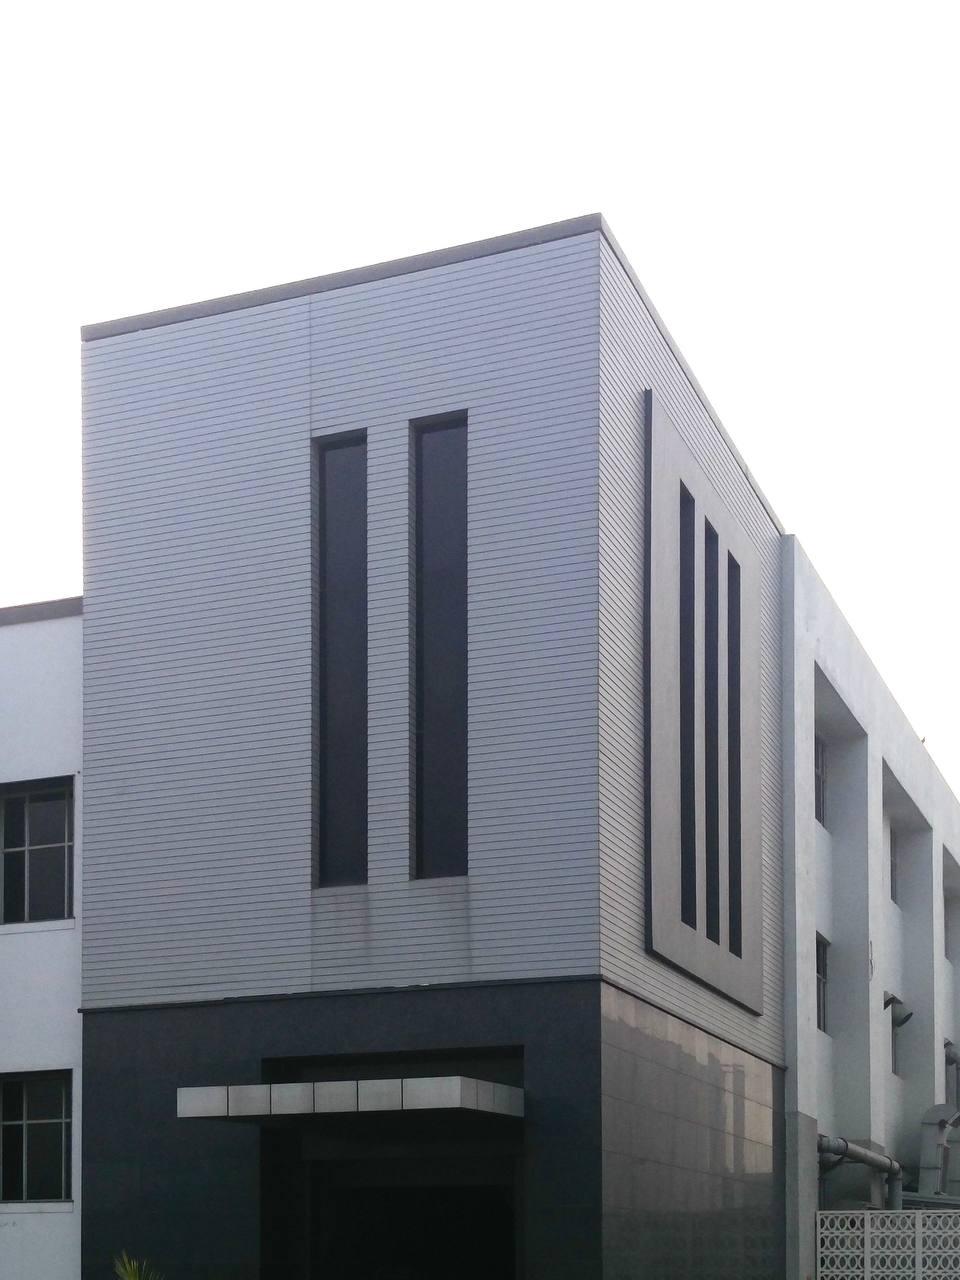 Facade- Aluminium cladding - Kundli sonipat (4)